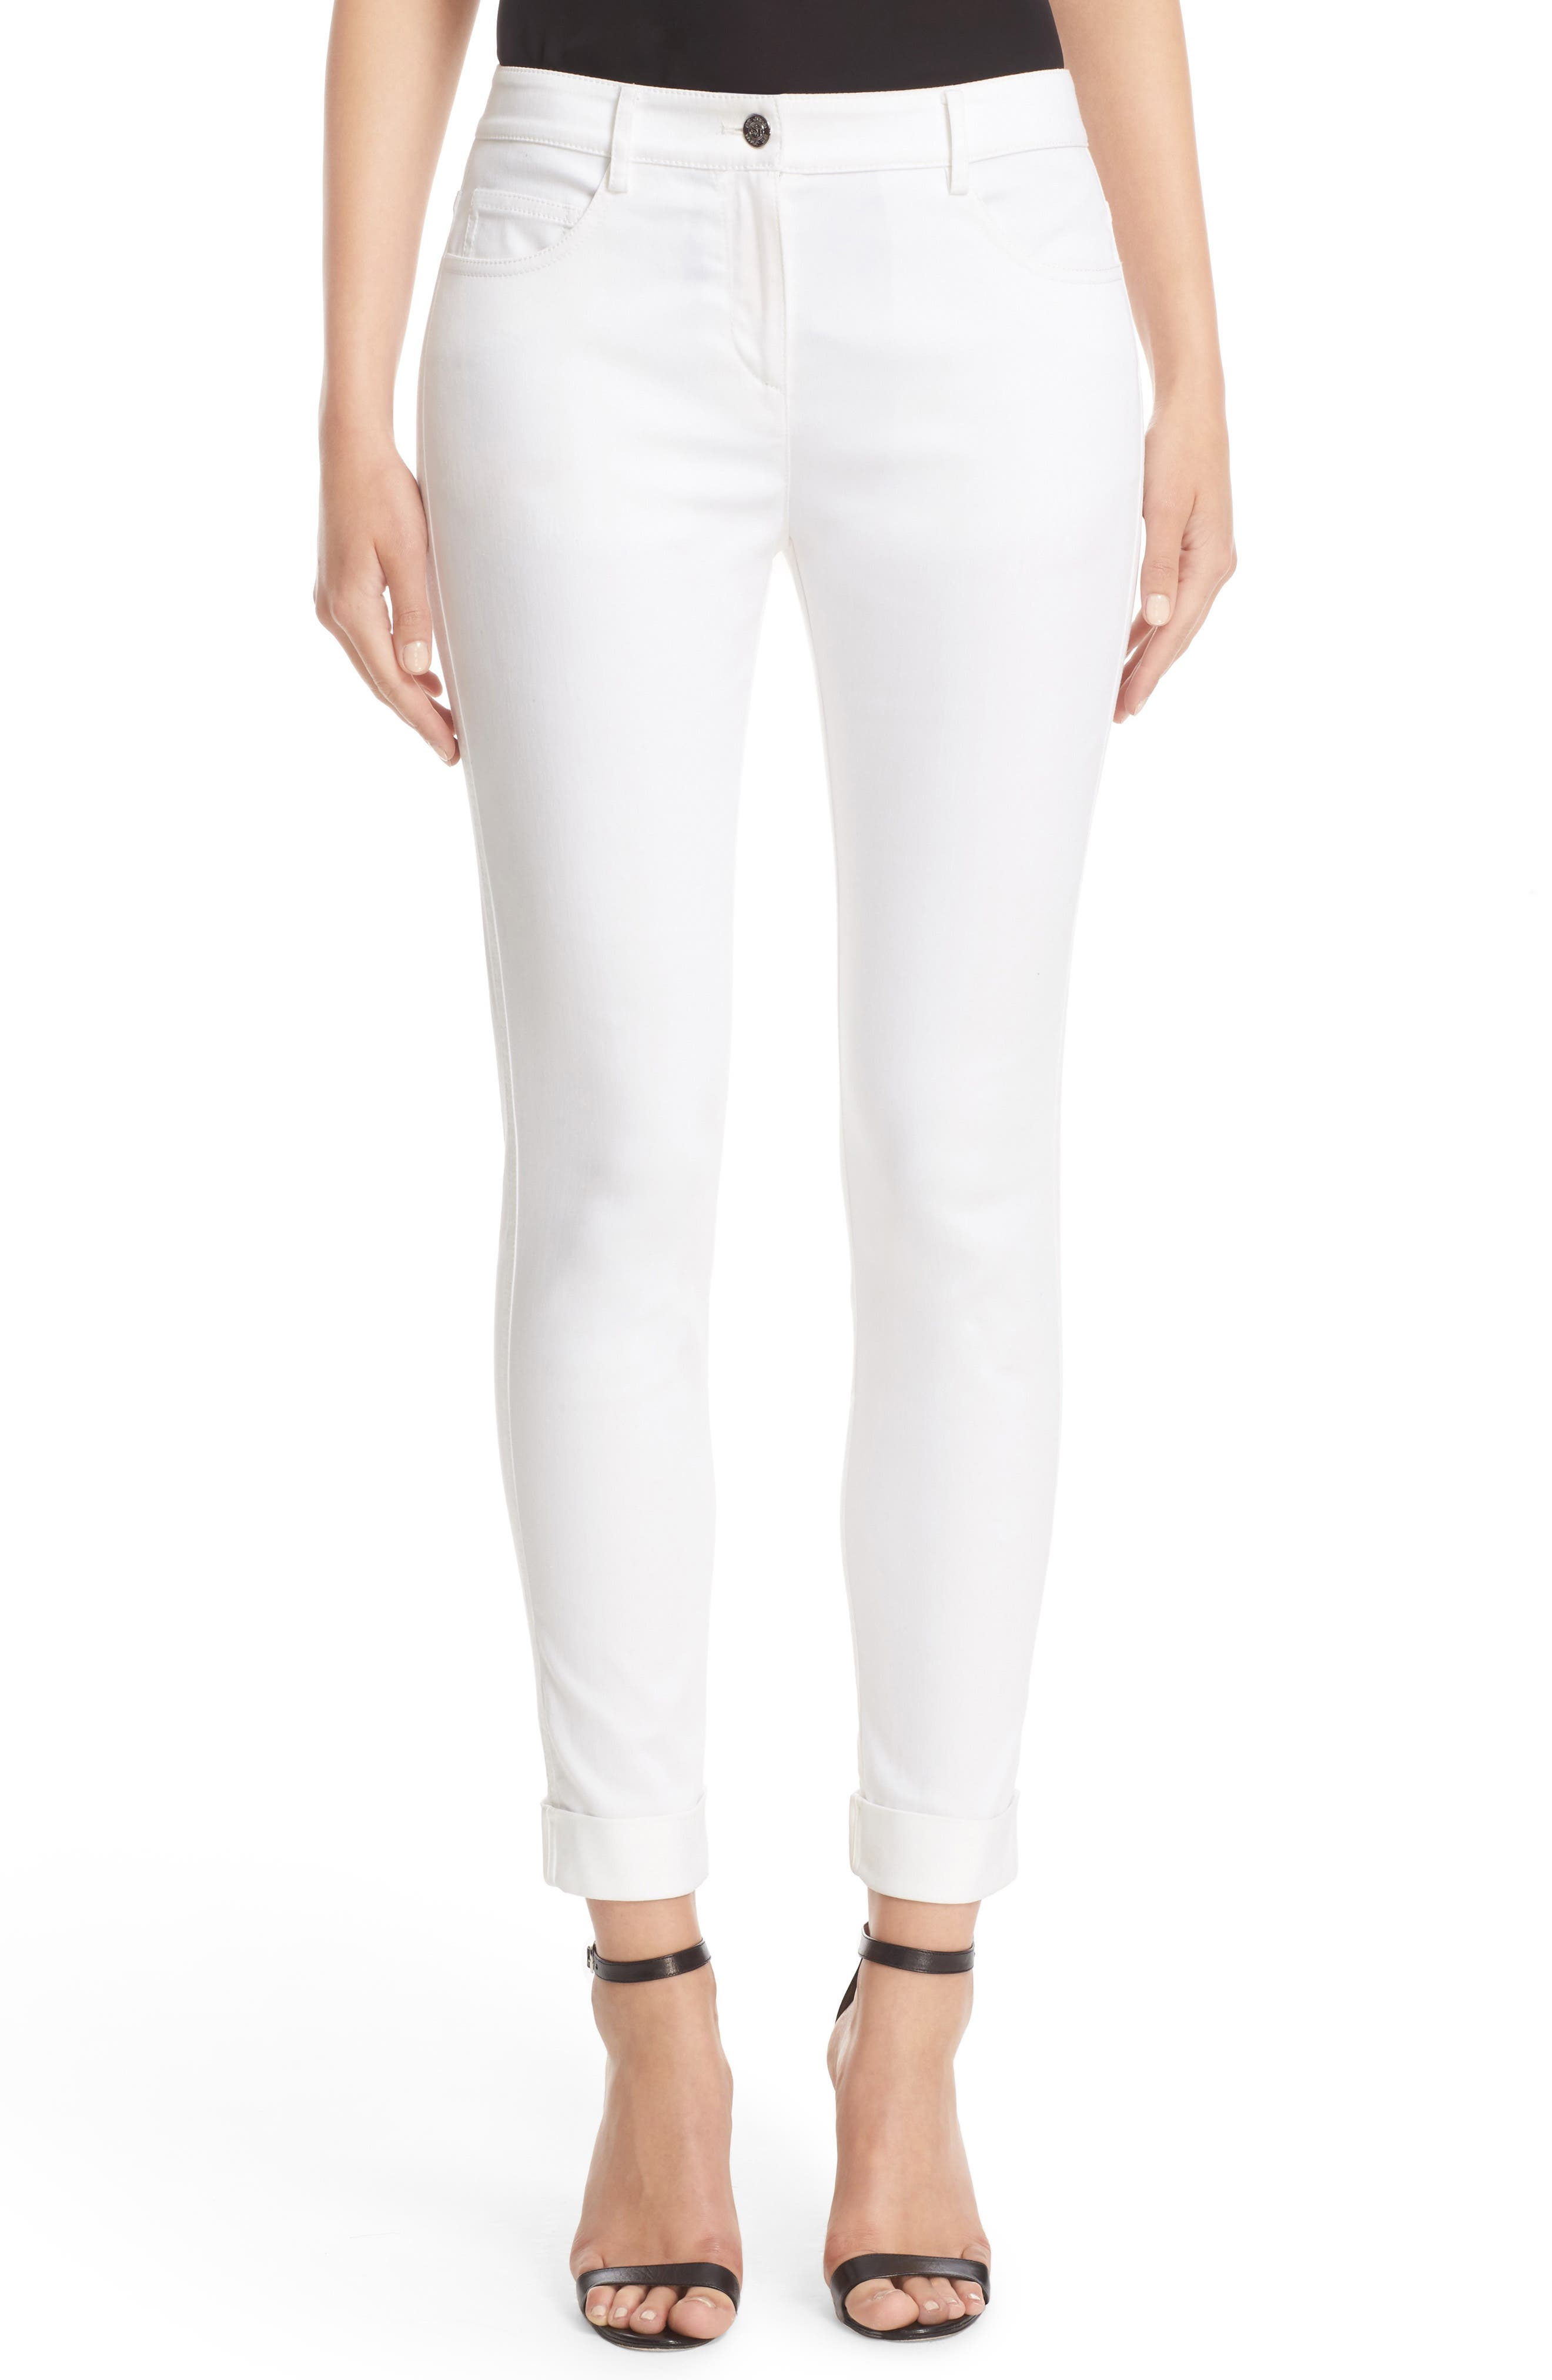 Alternate Image 1 Selected - St. John Sport Collection Bardot Slim Capri Jeans